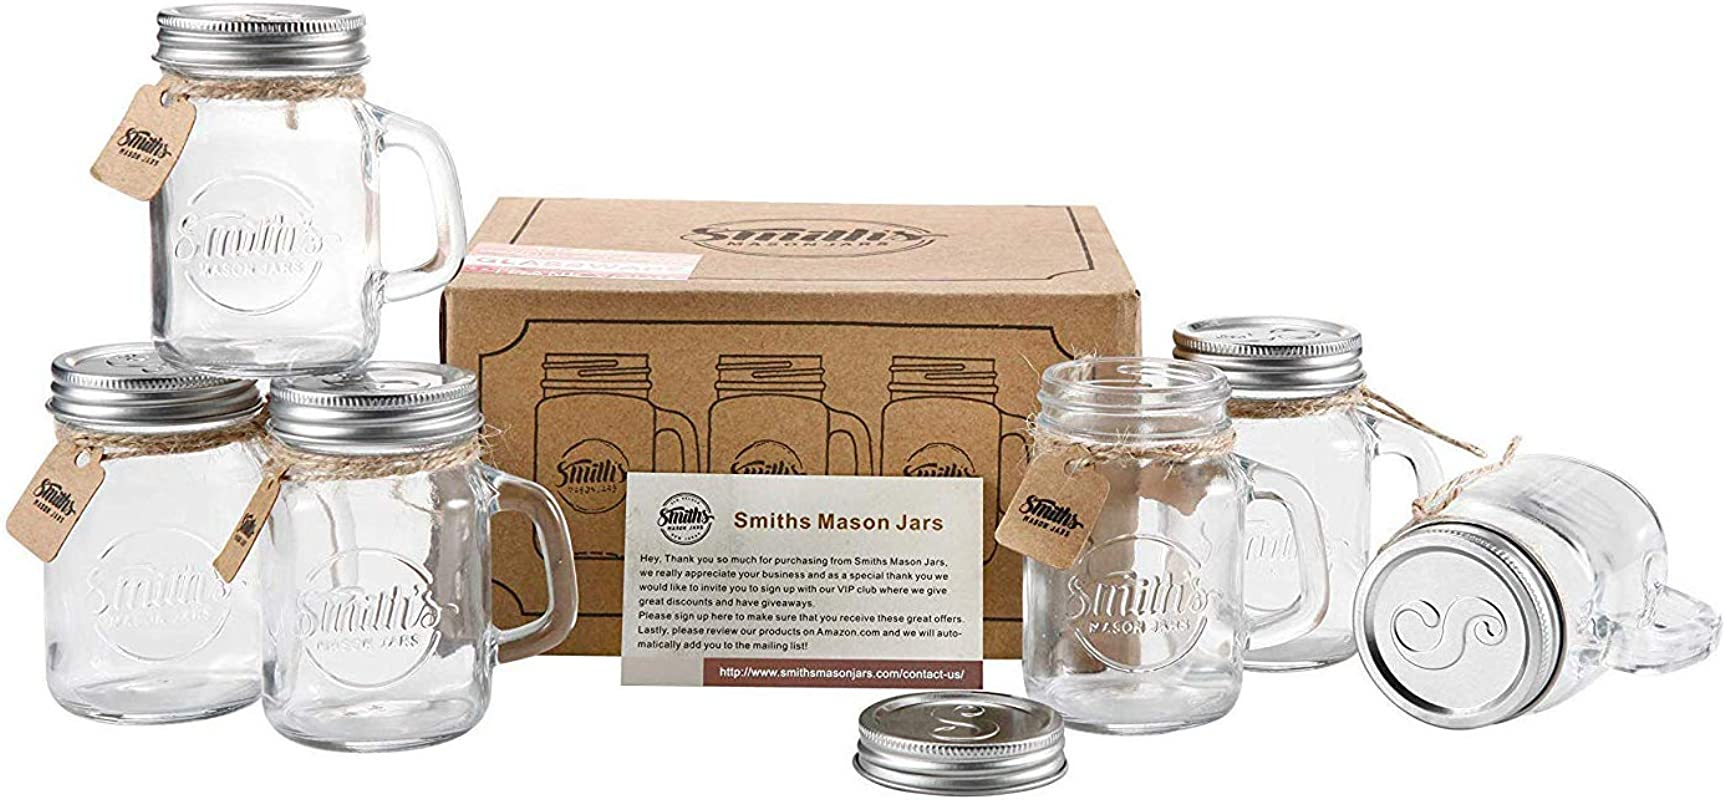 Smiths Mason Jars 6 X 16oz Mason Jar Mugs With Lids Great Mason Jar Old Fashioned Glasses